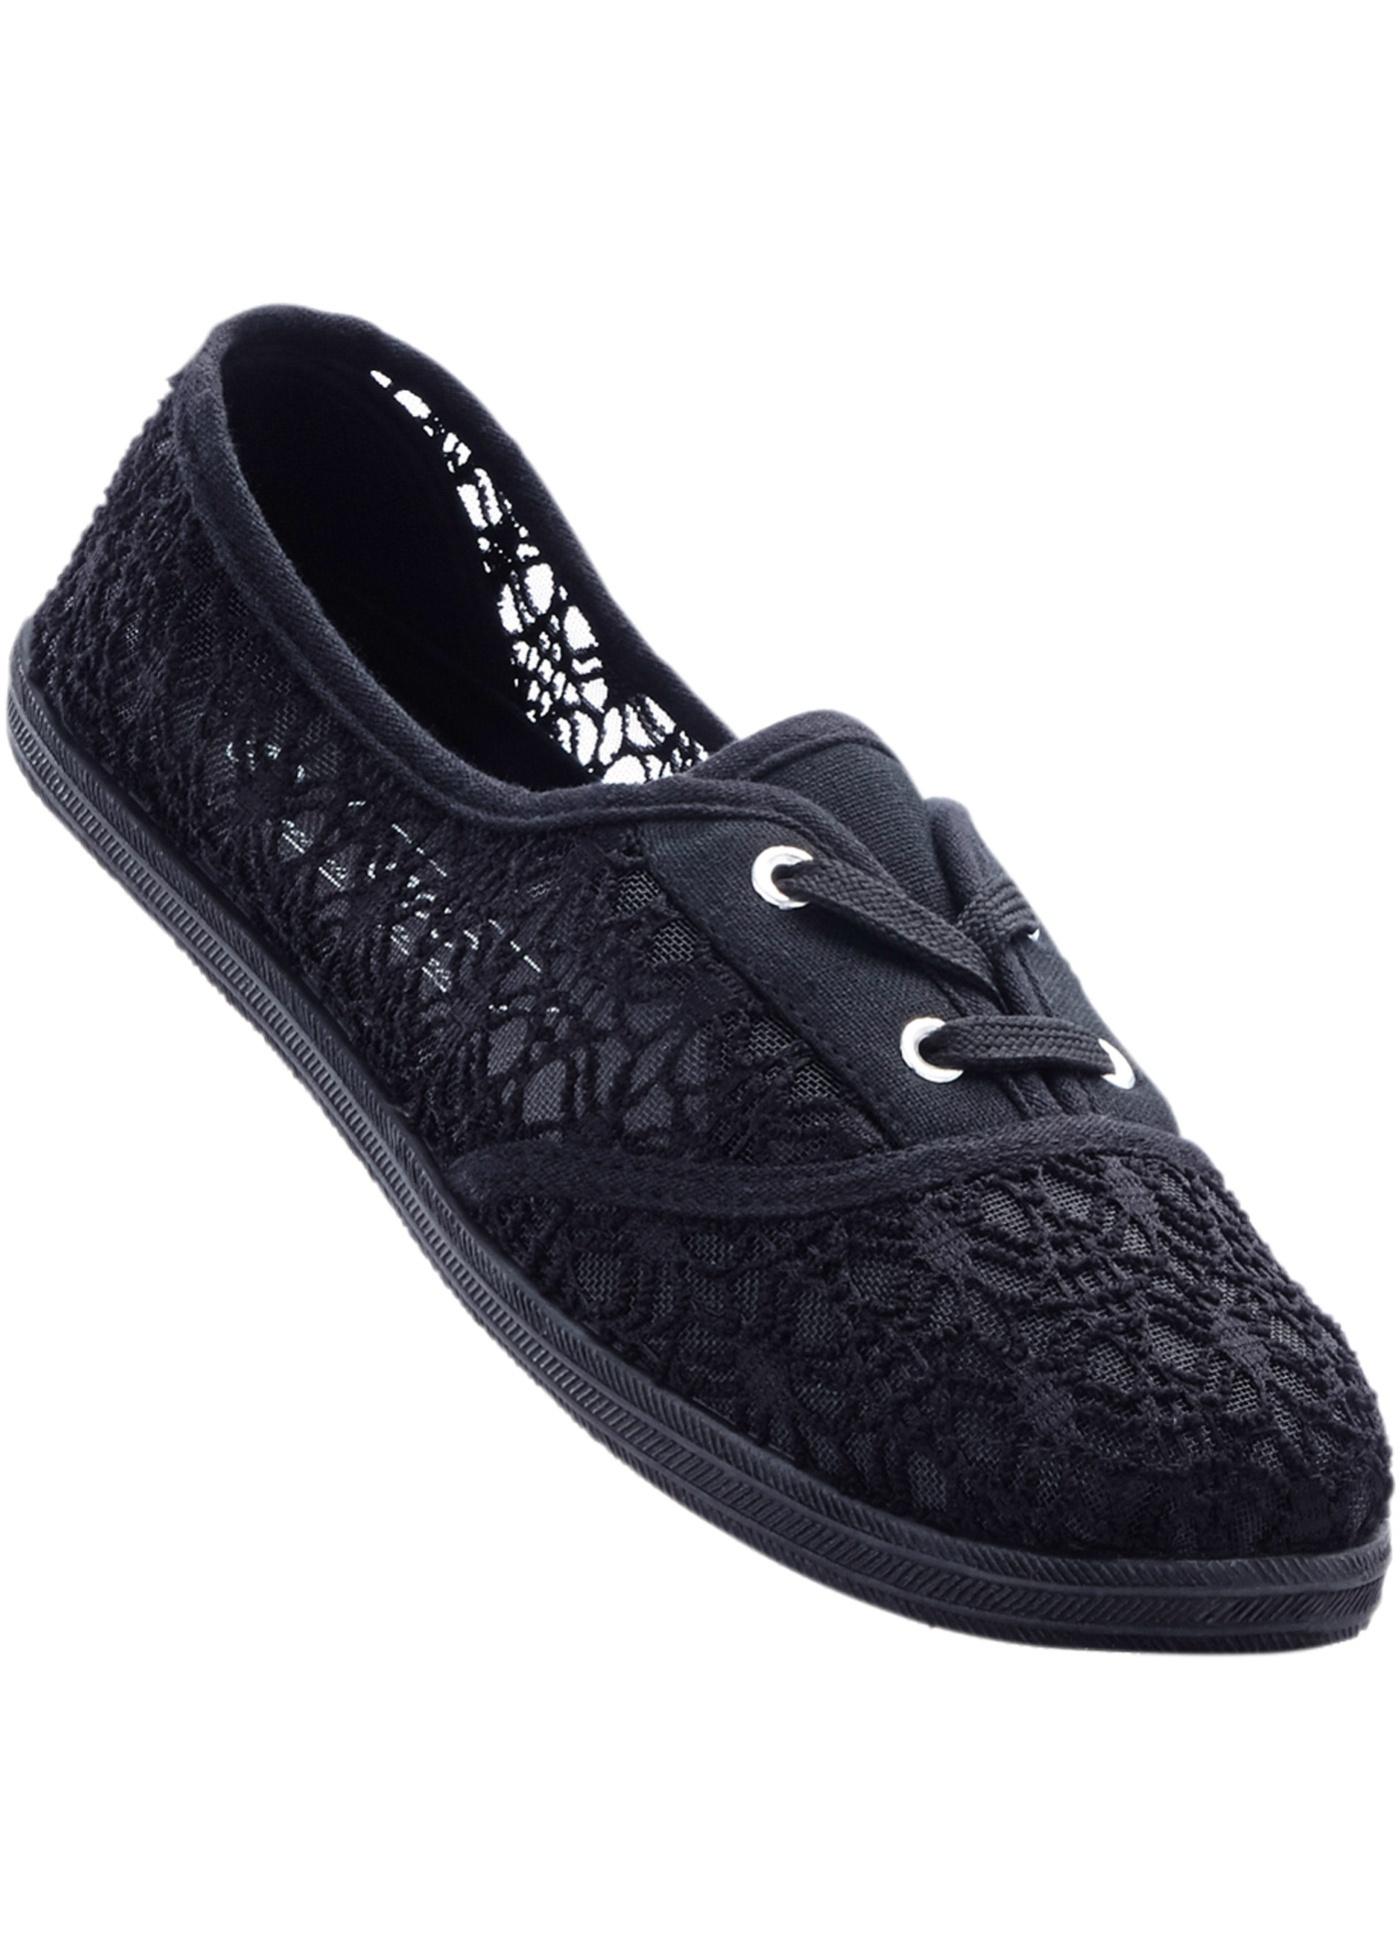 Sneaker  Nero  - bpc bonp